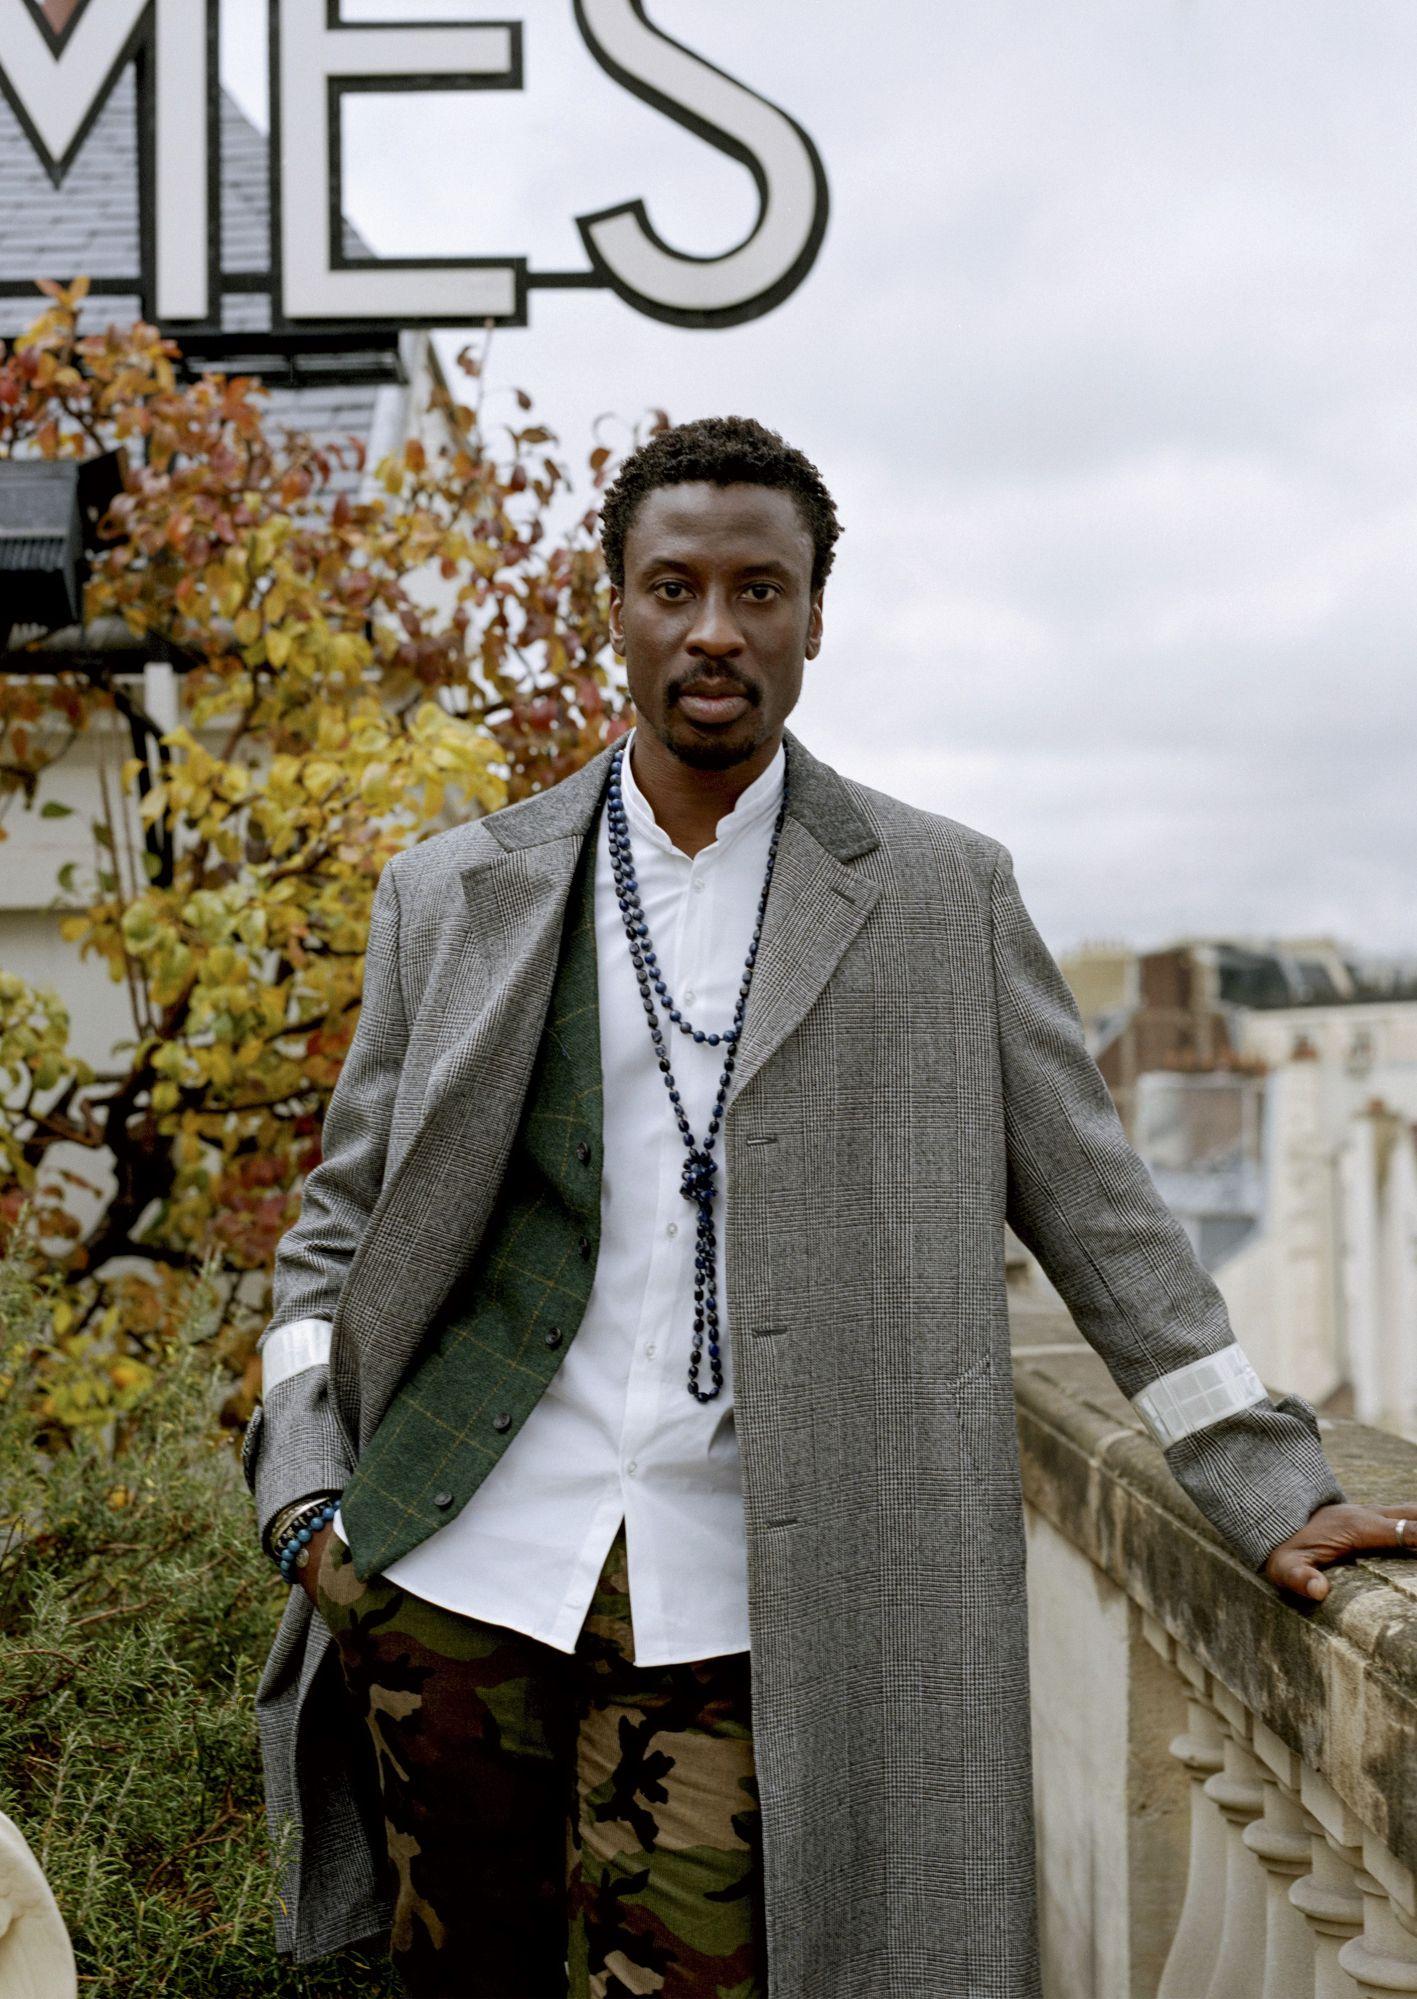 Meet Ini Archibong, The Man Who Designed Hermès' Latest Watch